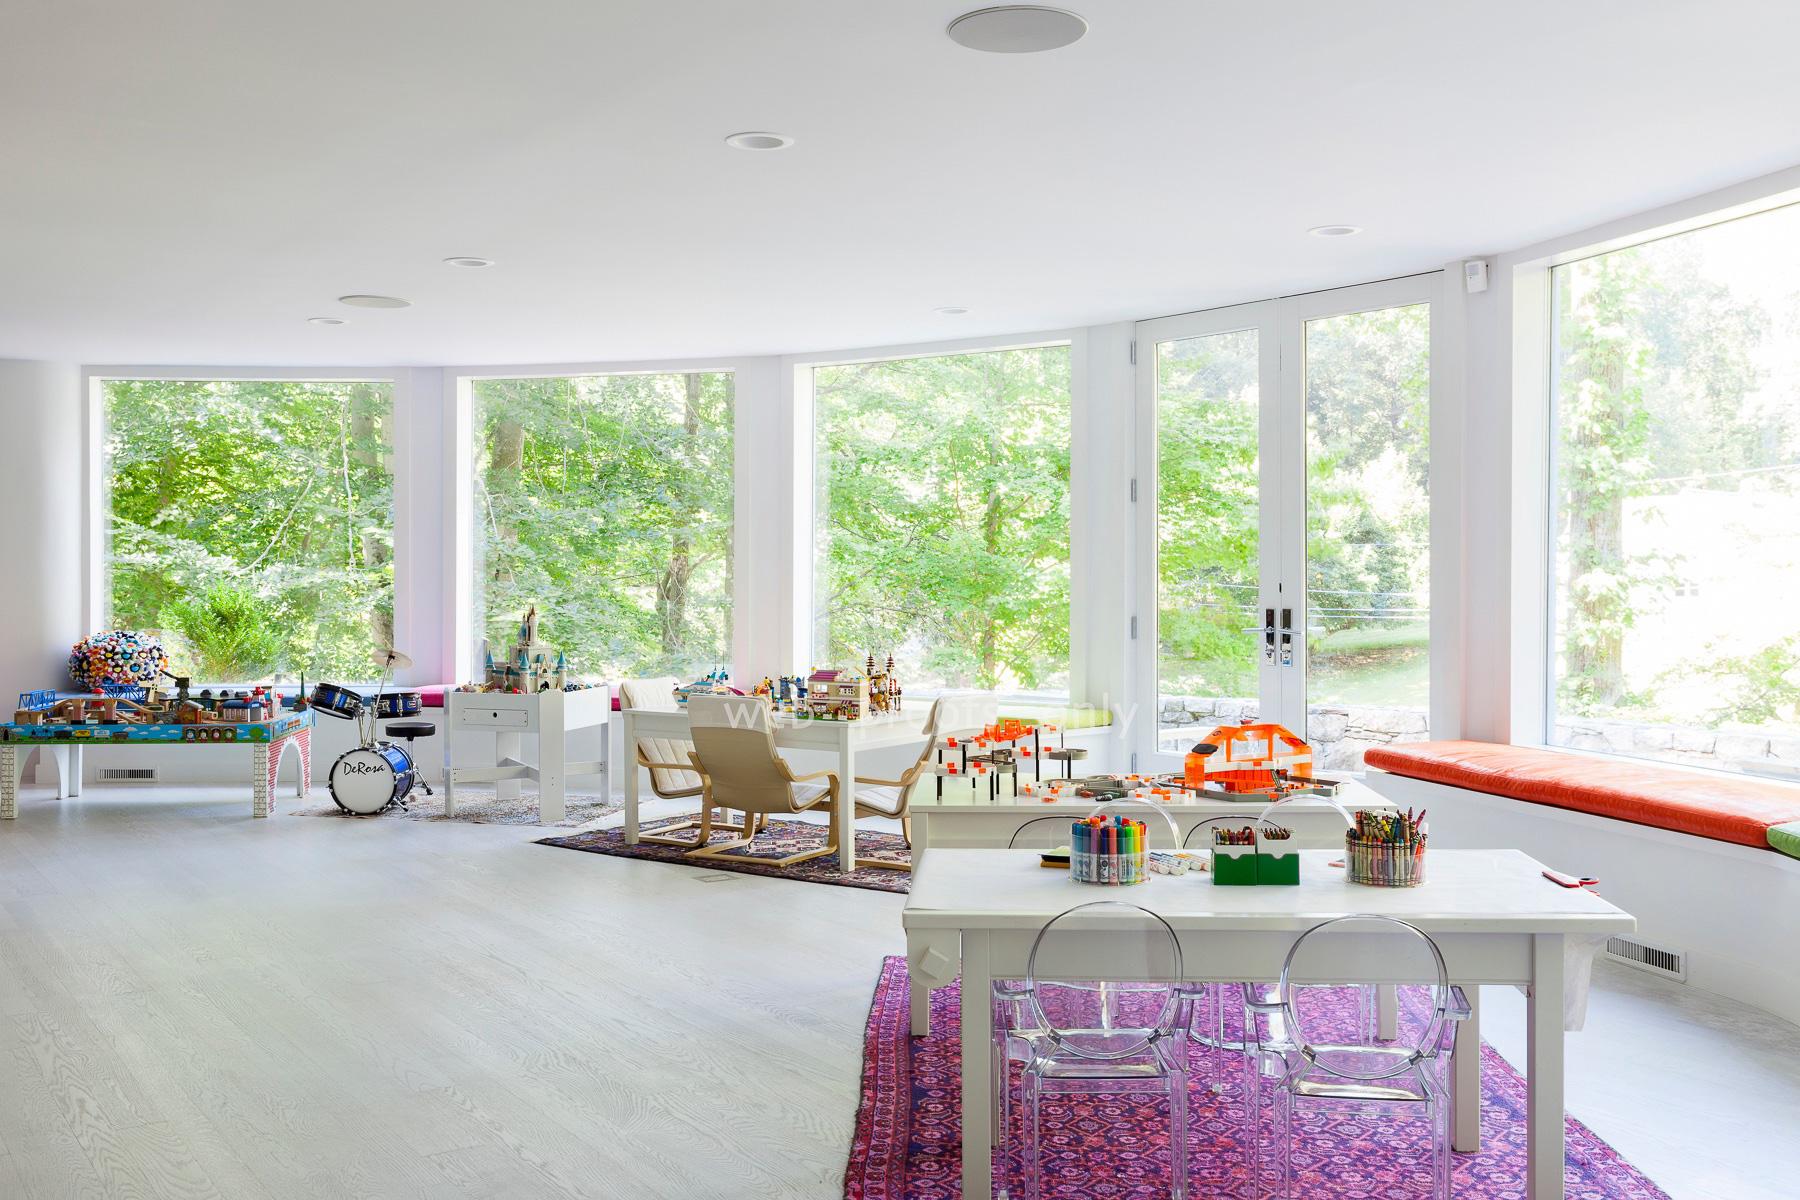 interiors-kids-are-people-new-10.jpg